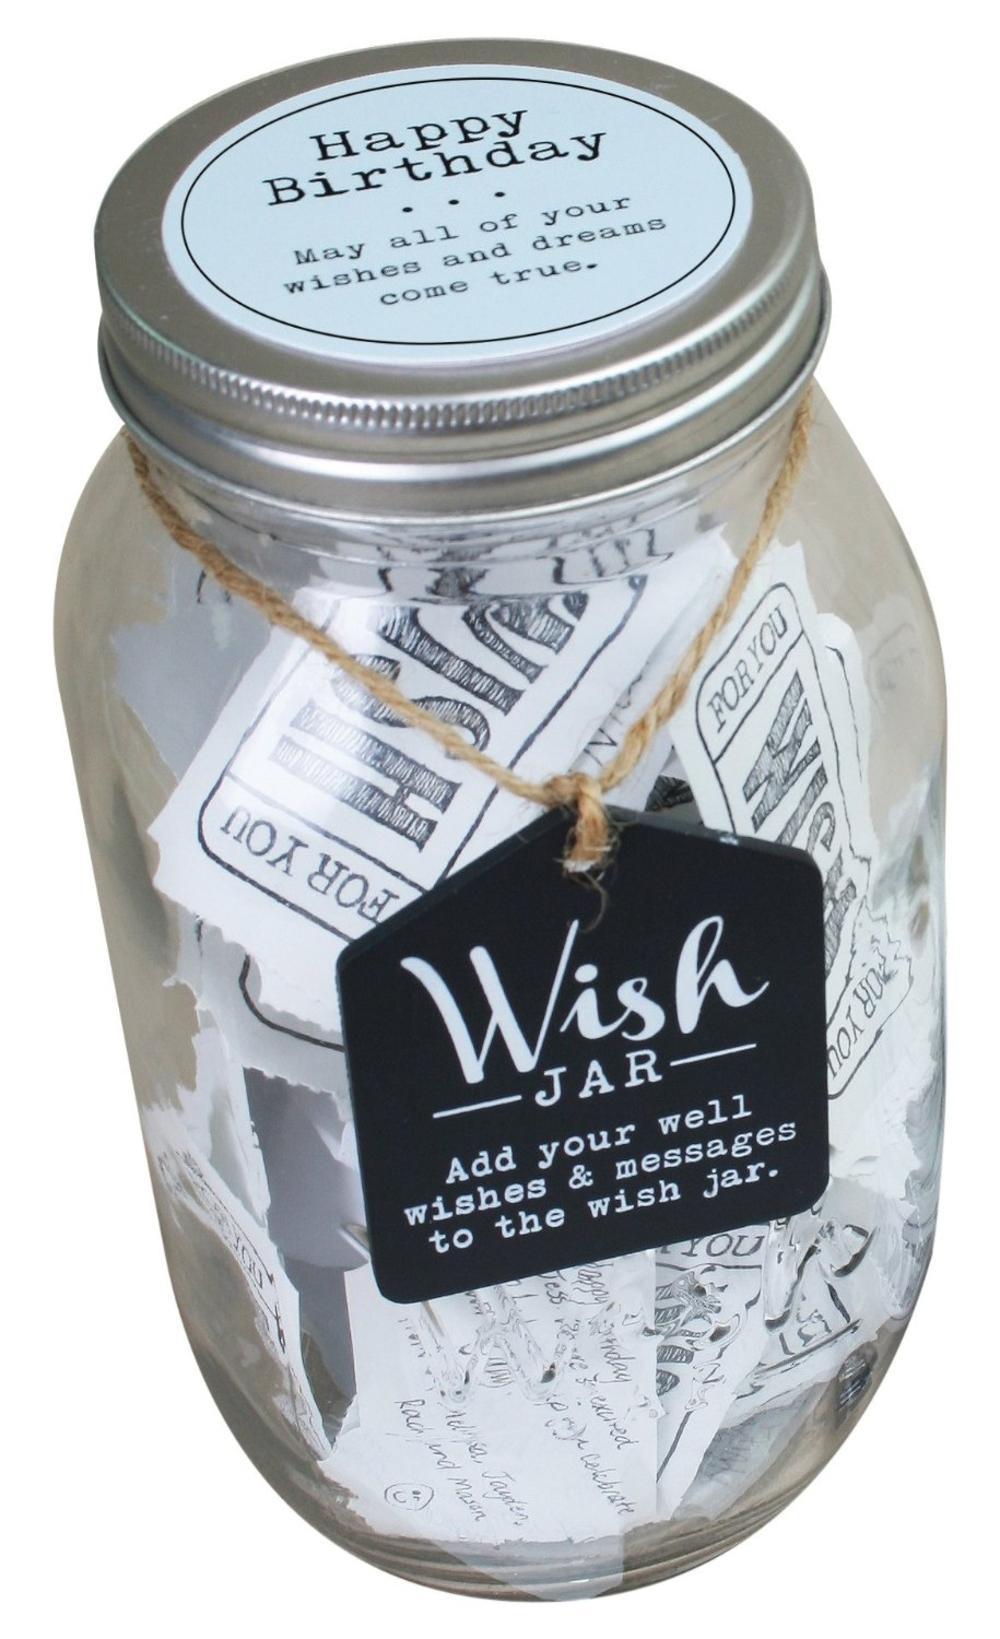 Splosh His Birthday Wish Jar Gift Idea Gifts Love Kates